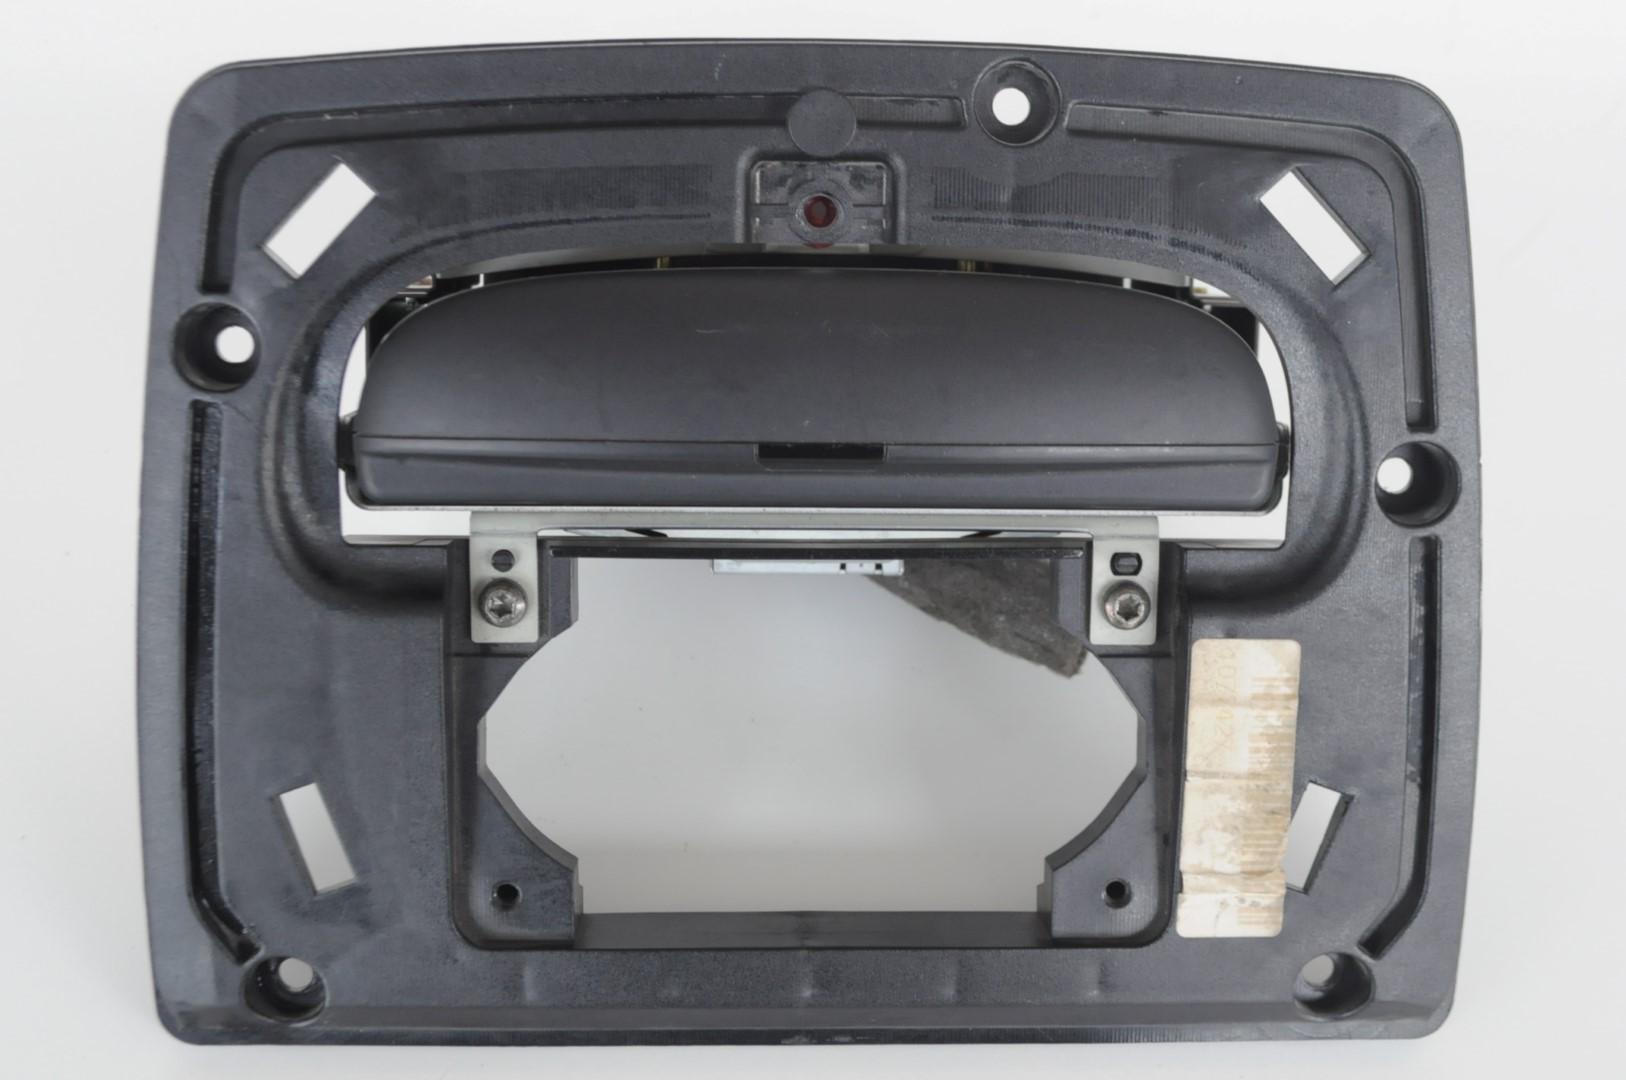 volvo xc90 2005 rhd gps sat nav navigation display screen. Black Bedroom Furniture Sets. Home Design Ideas